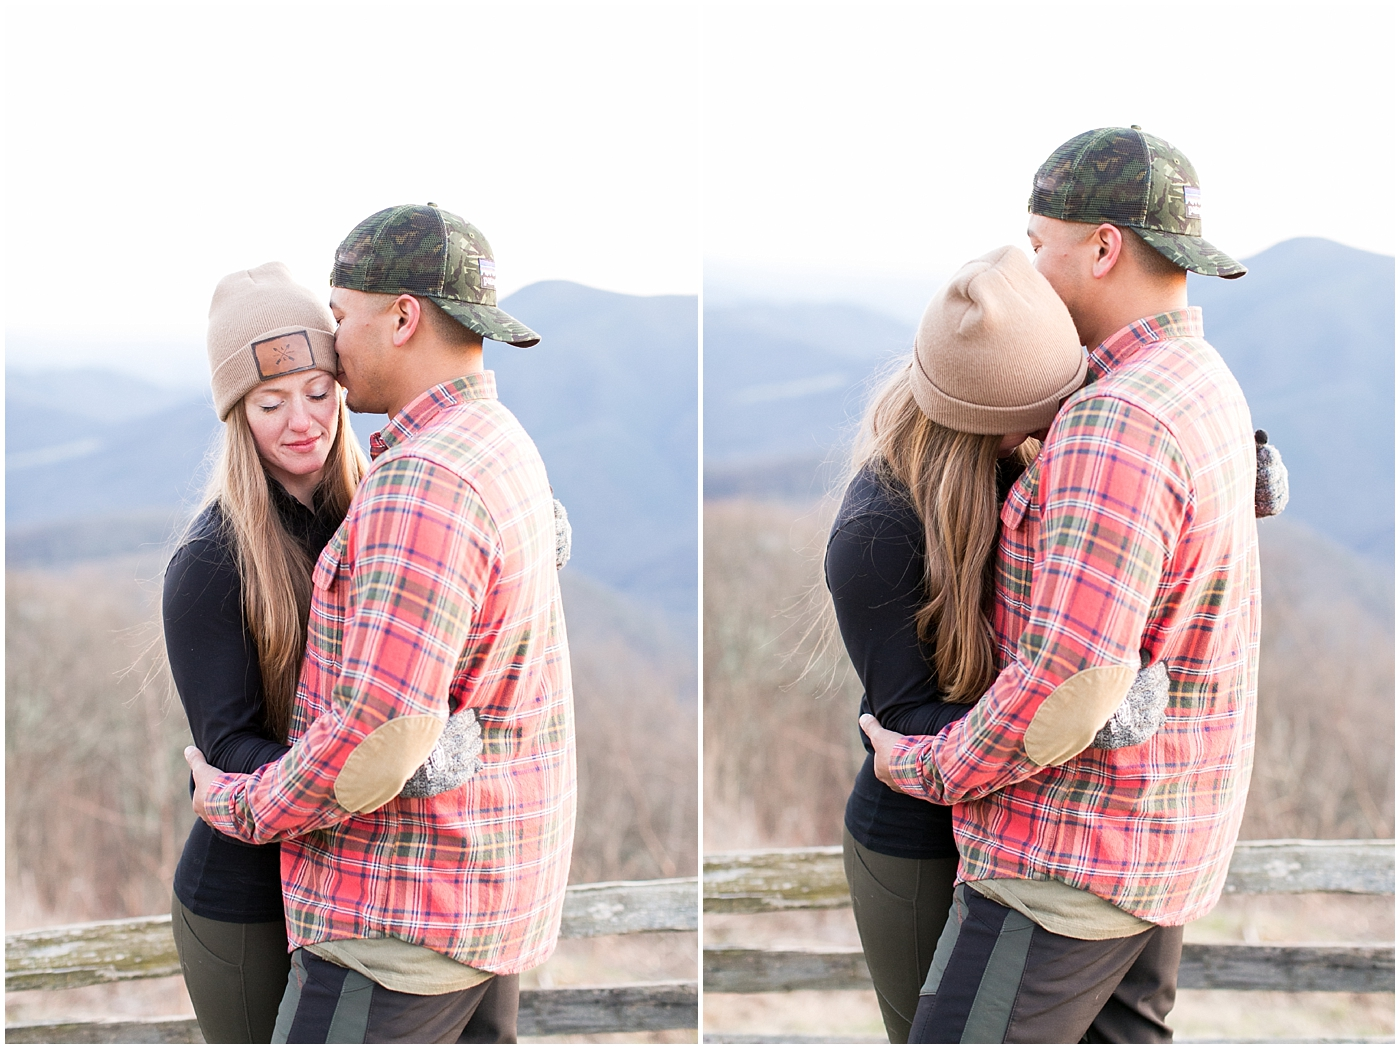 virginia engagement photography wintergreen resort couple hiking photography jessica ryan photography